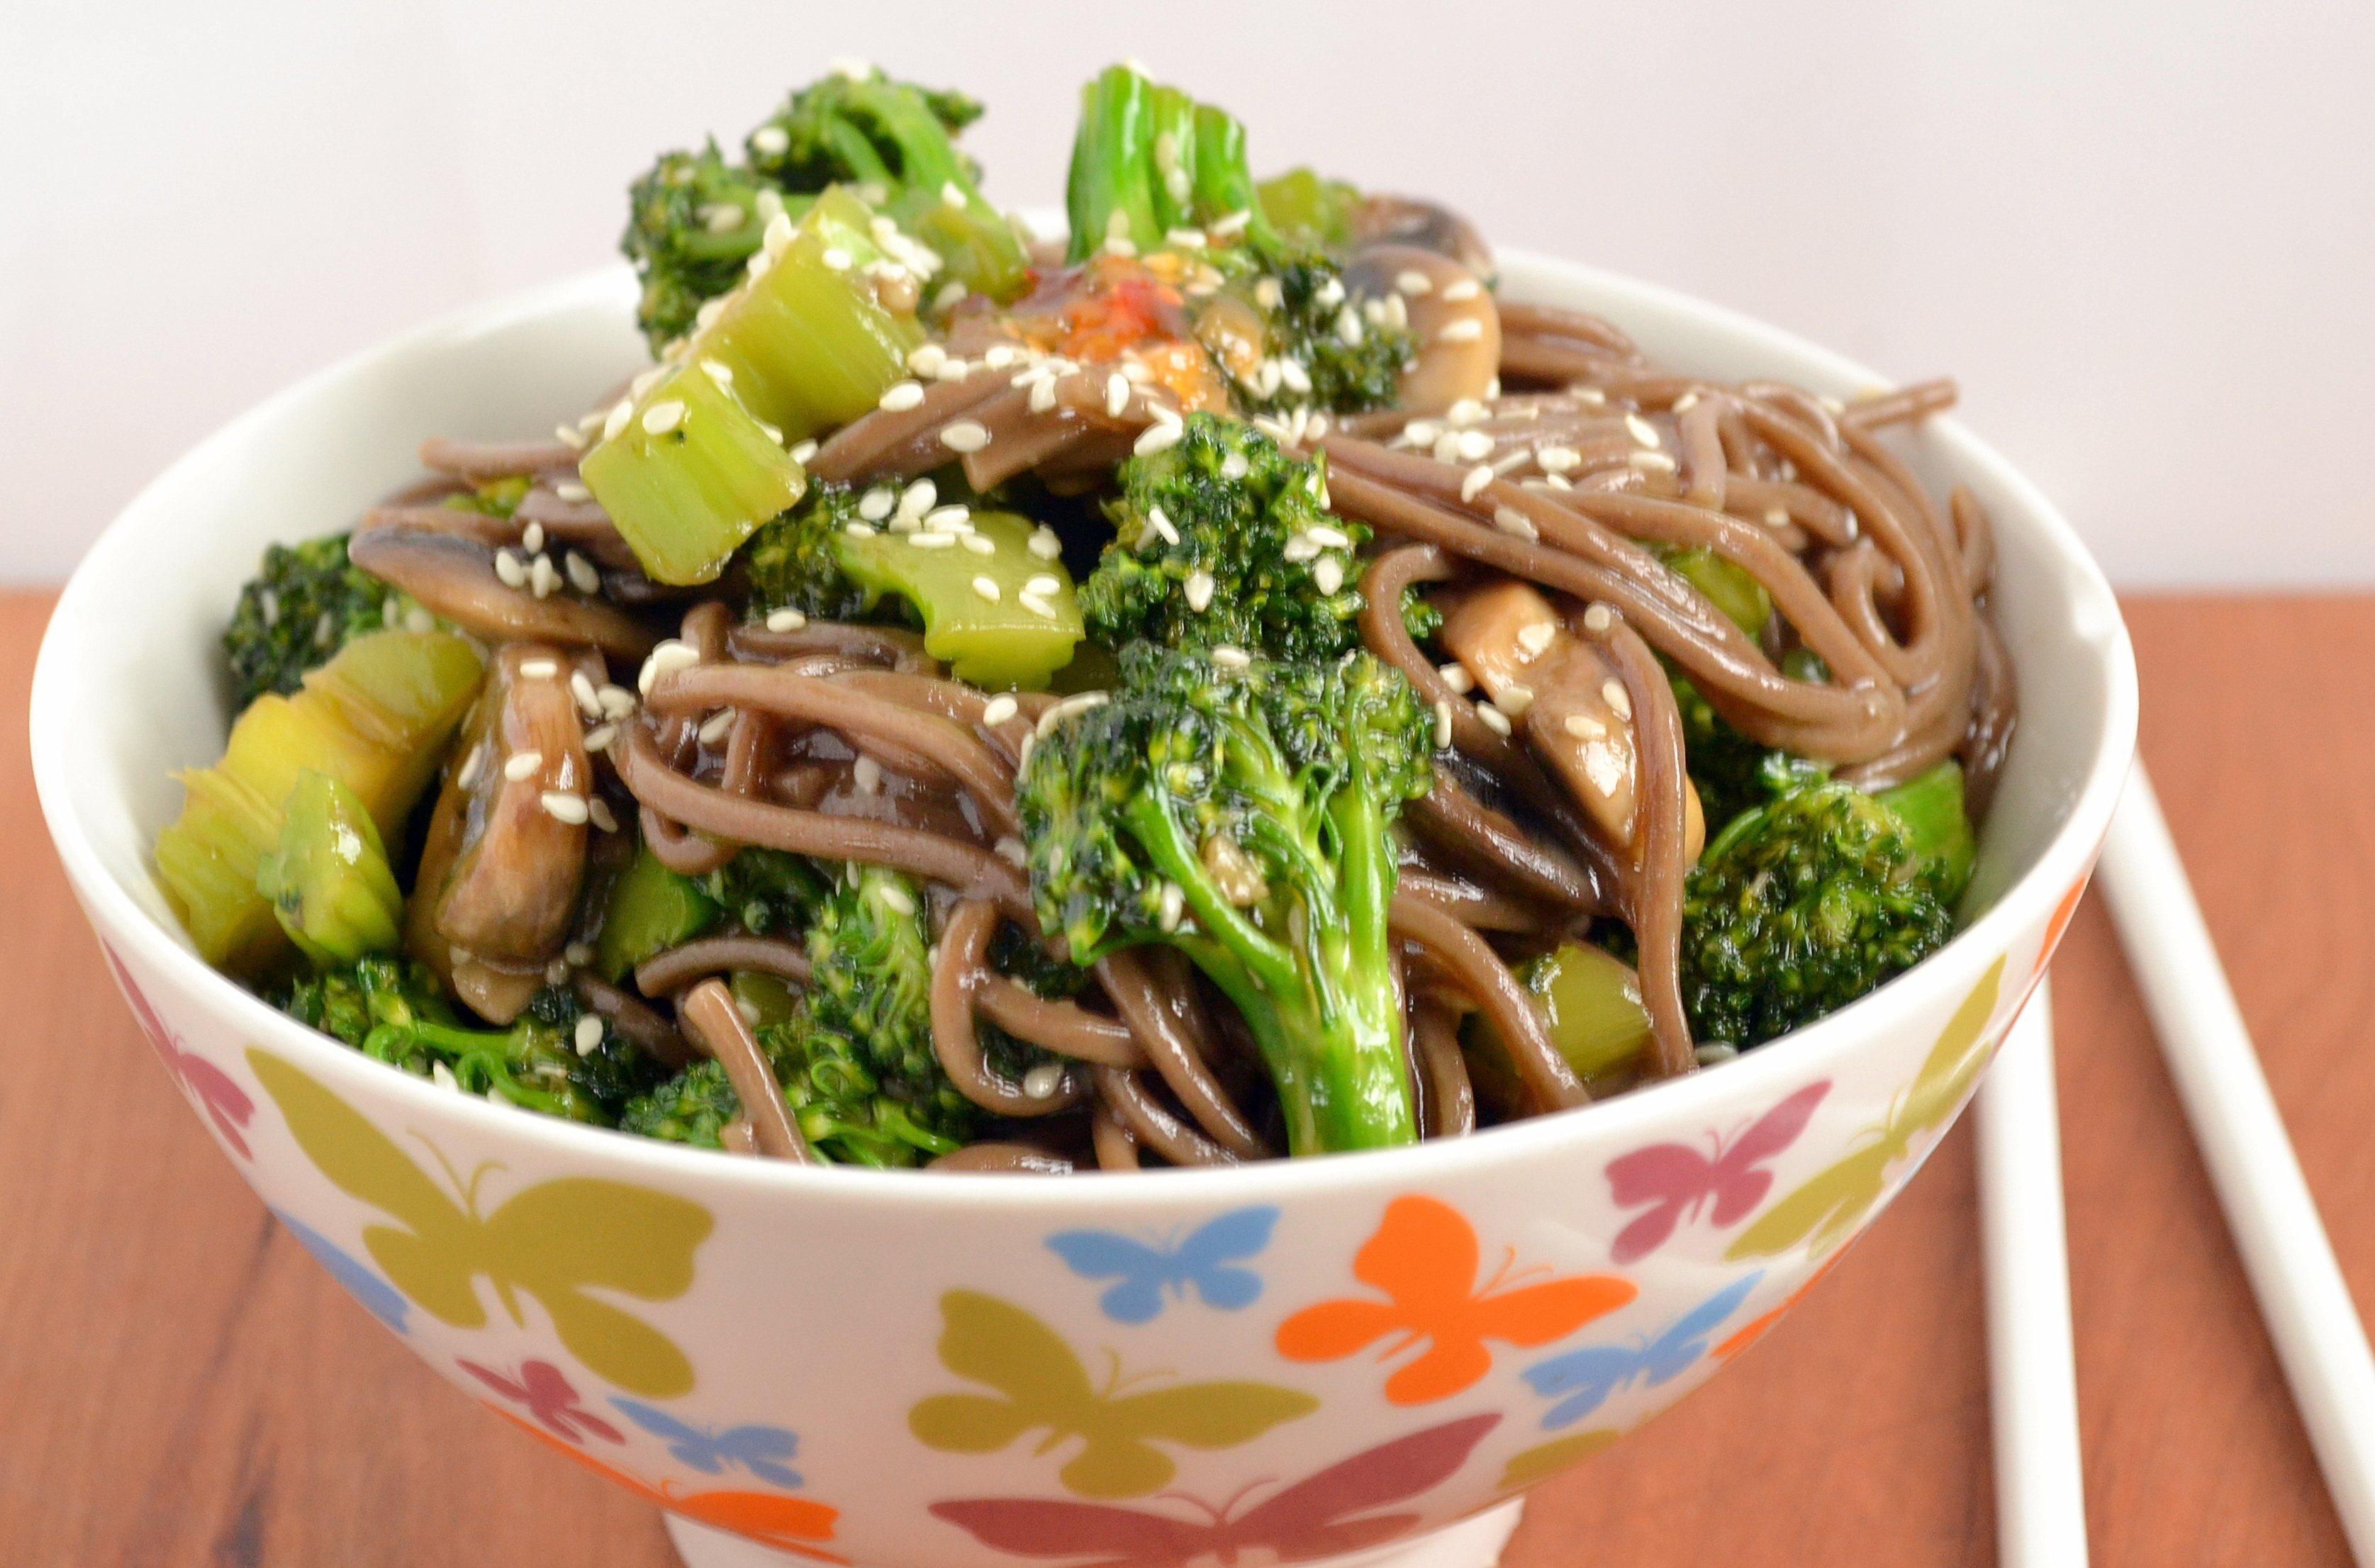 ... Recipe #76: Chinese Stir Fry Buckwheat Noodles - Live Energized